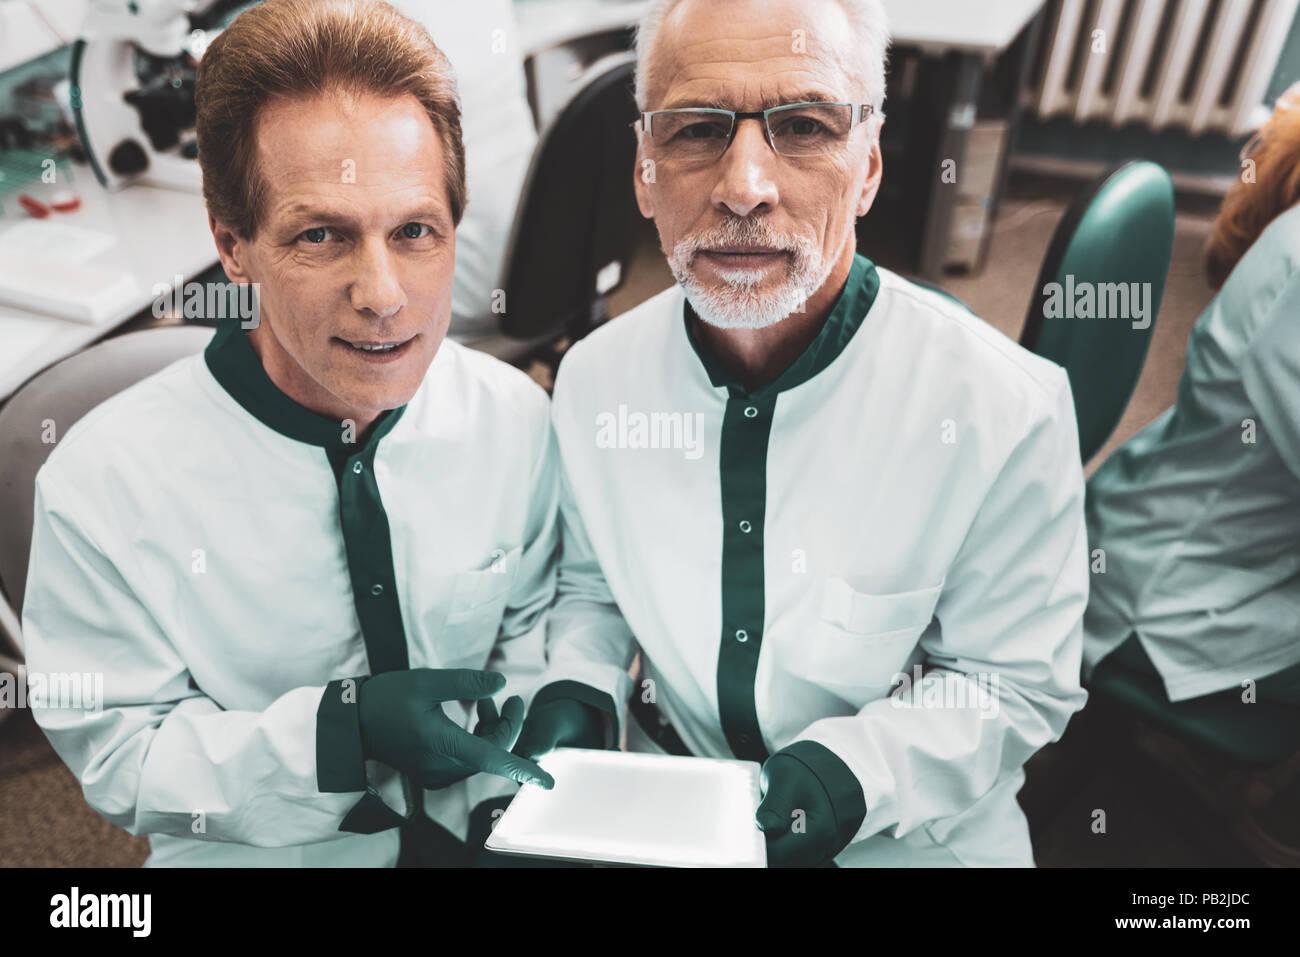 Elderly researchers feeling responsible making DNA test - Stock Image